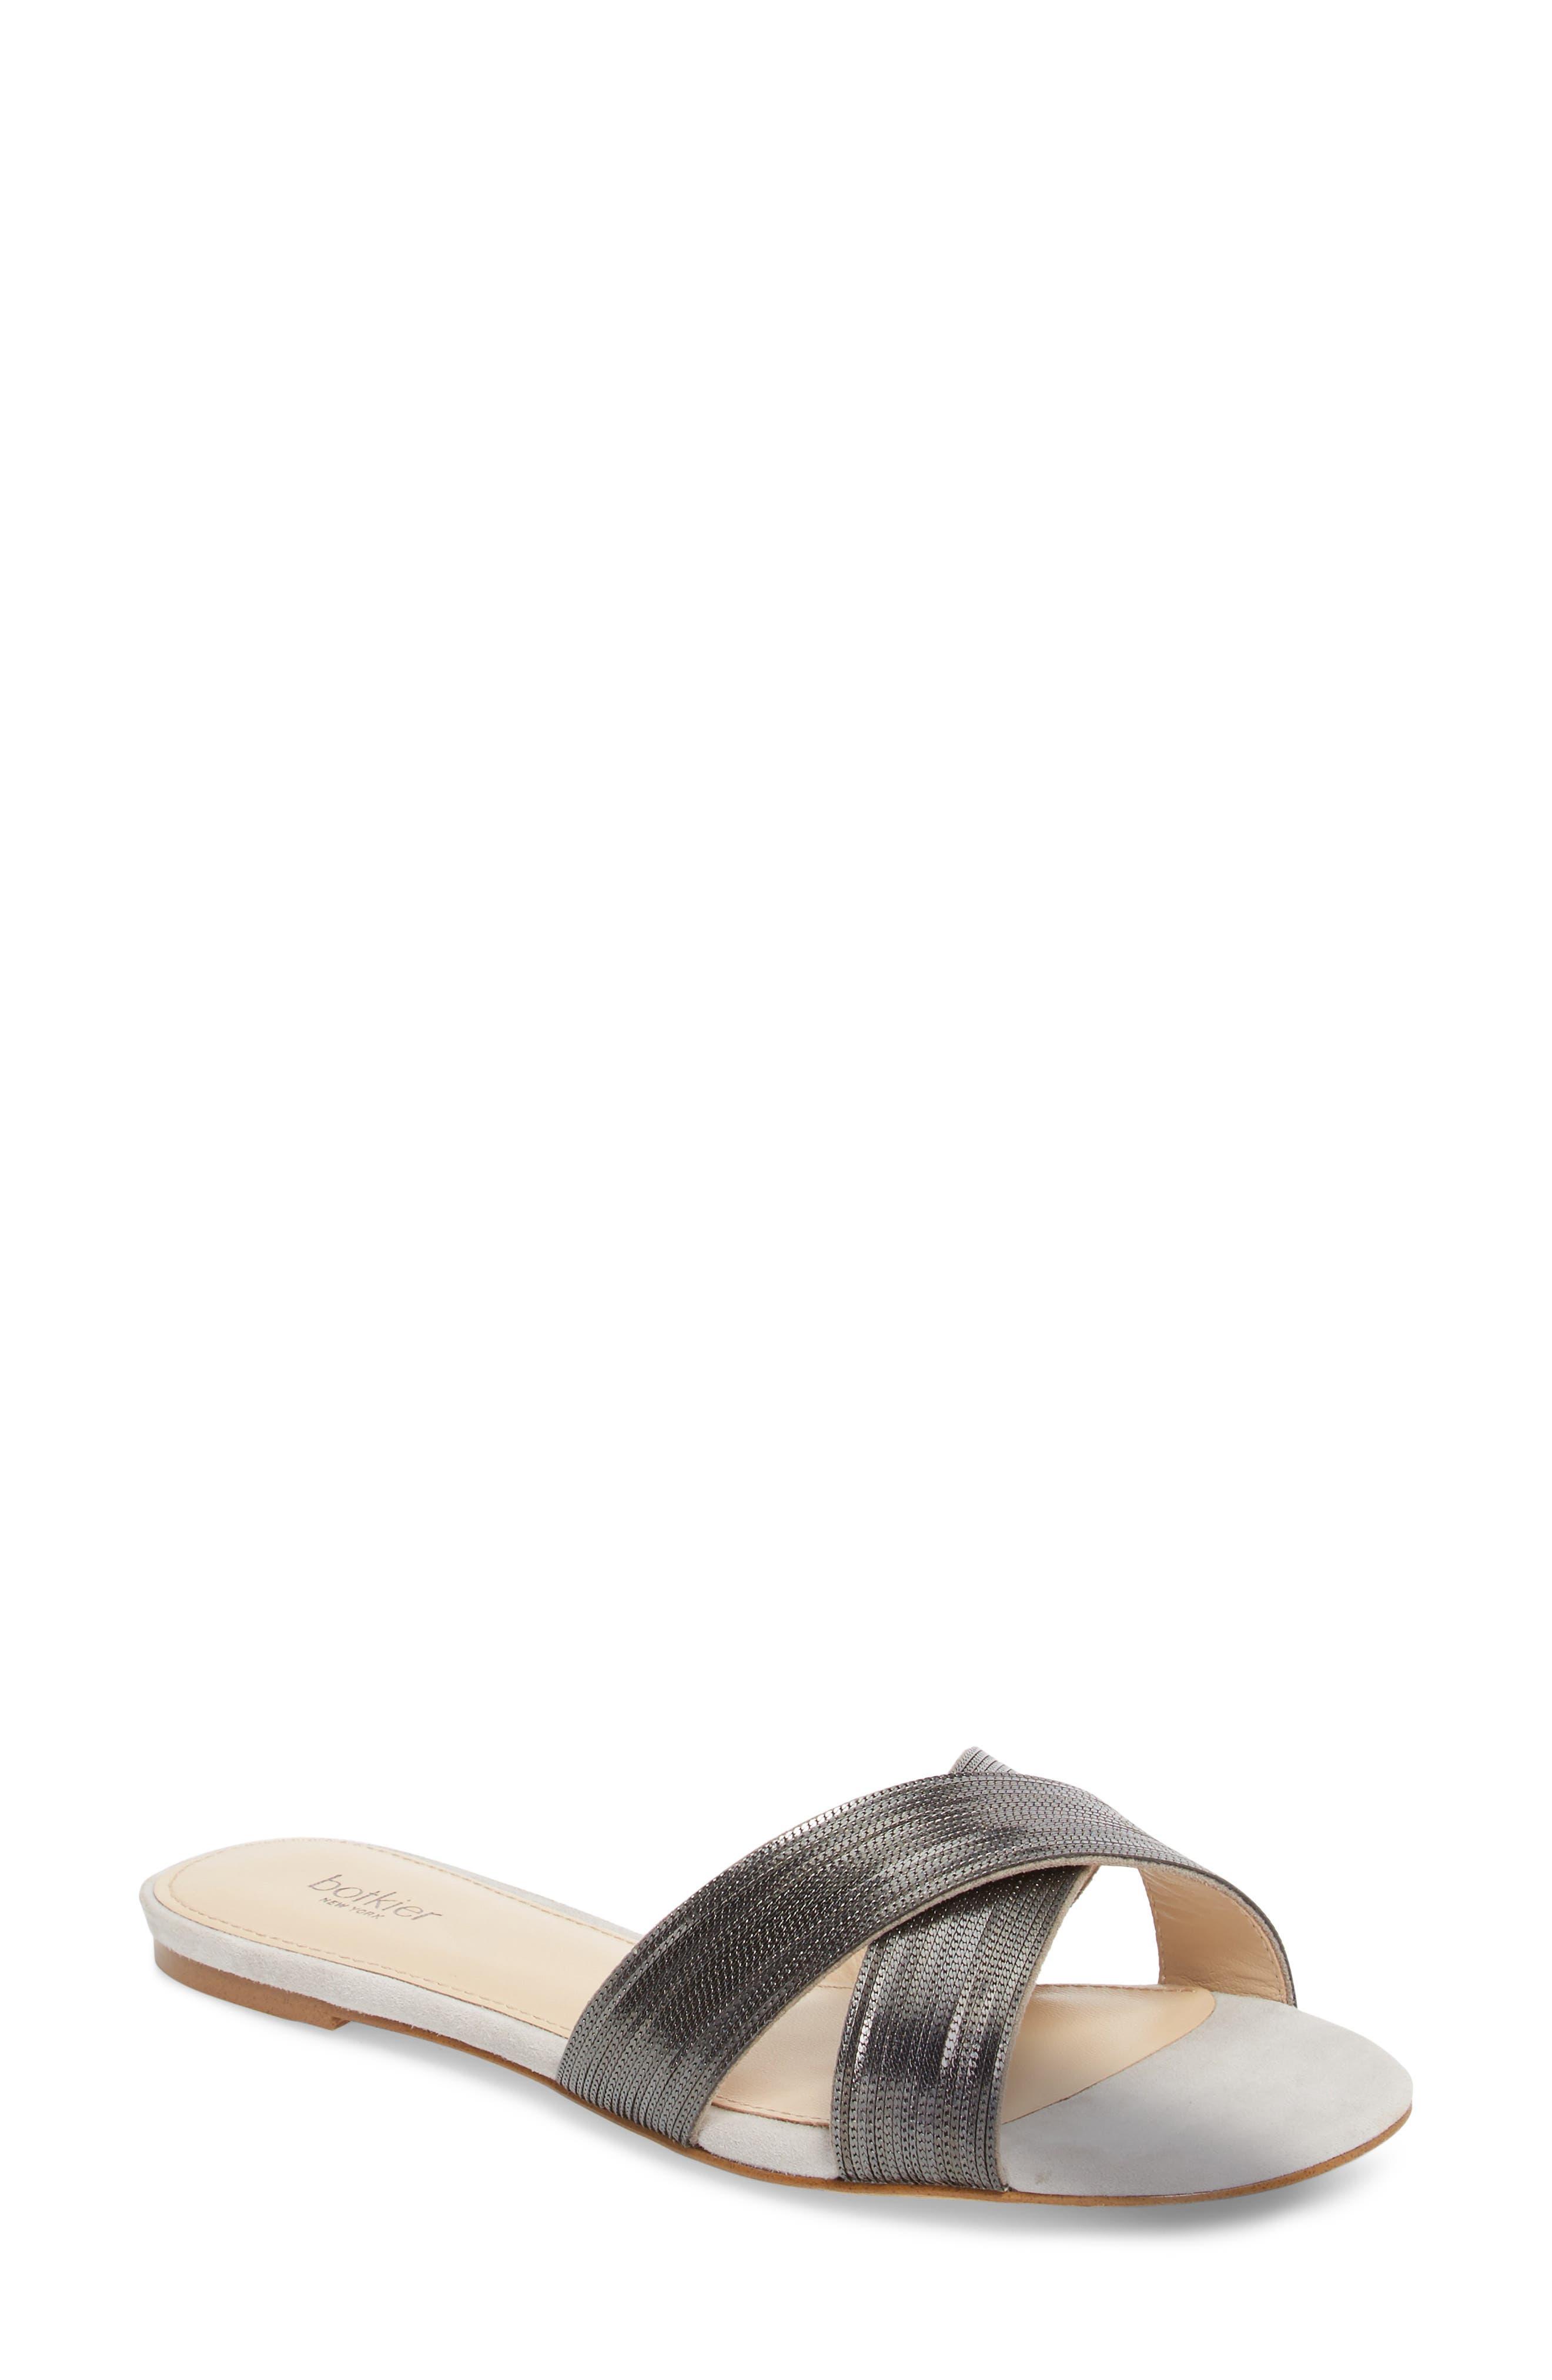 Millie Cross Strap Slide Sandal,                         Main,                         color, Clay/ Gunmetal Suede